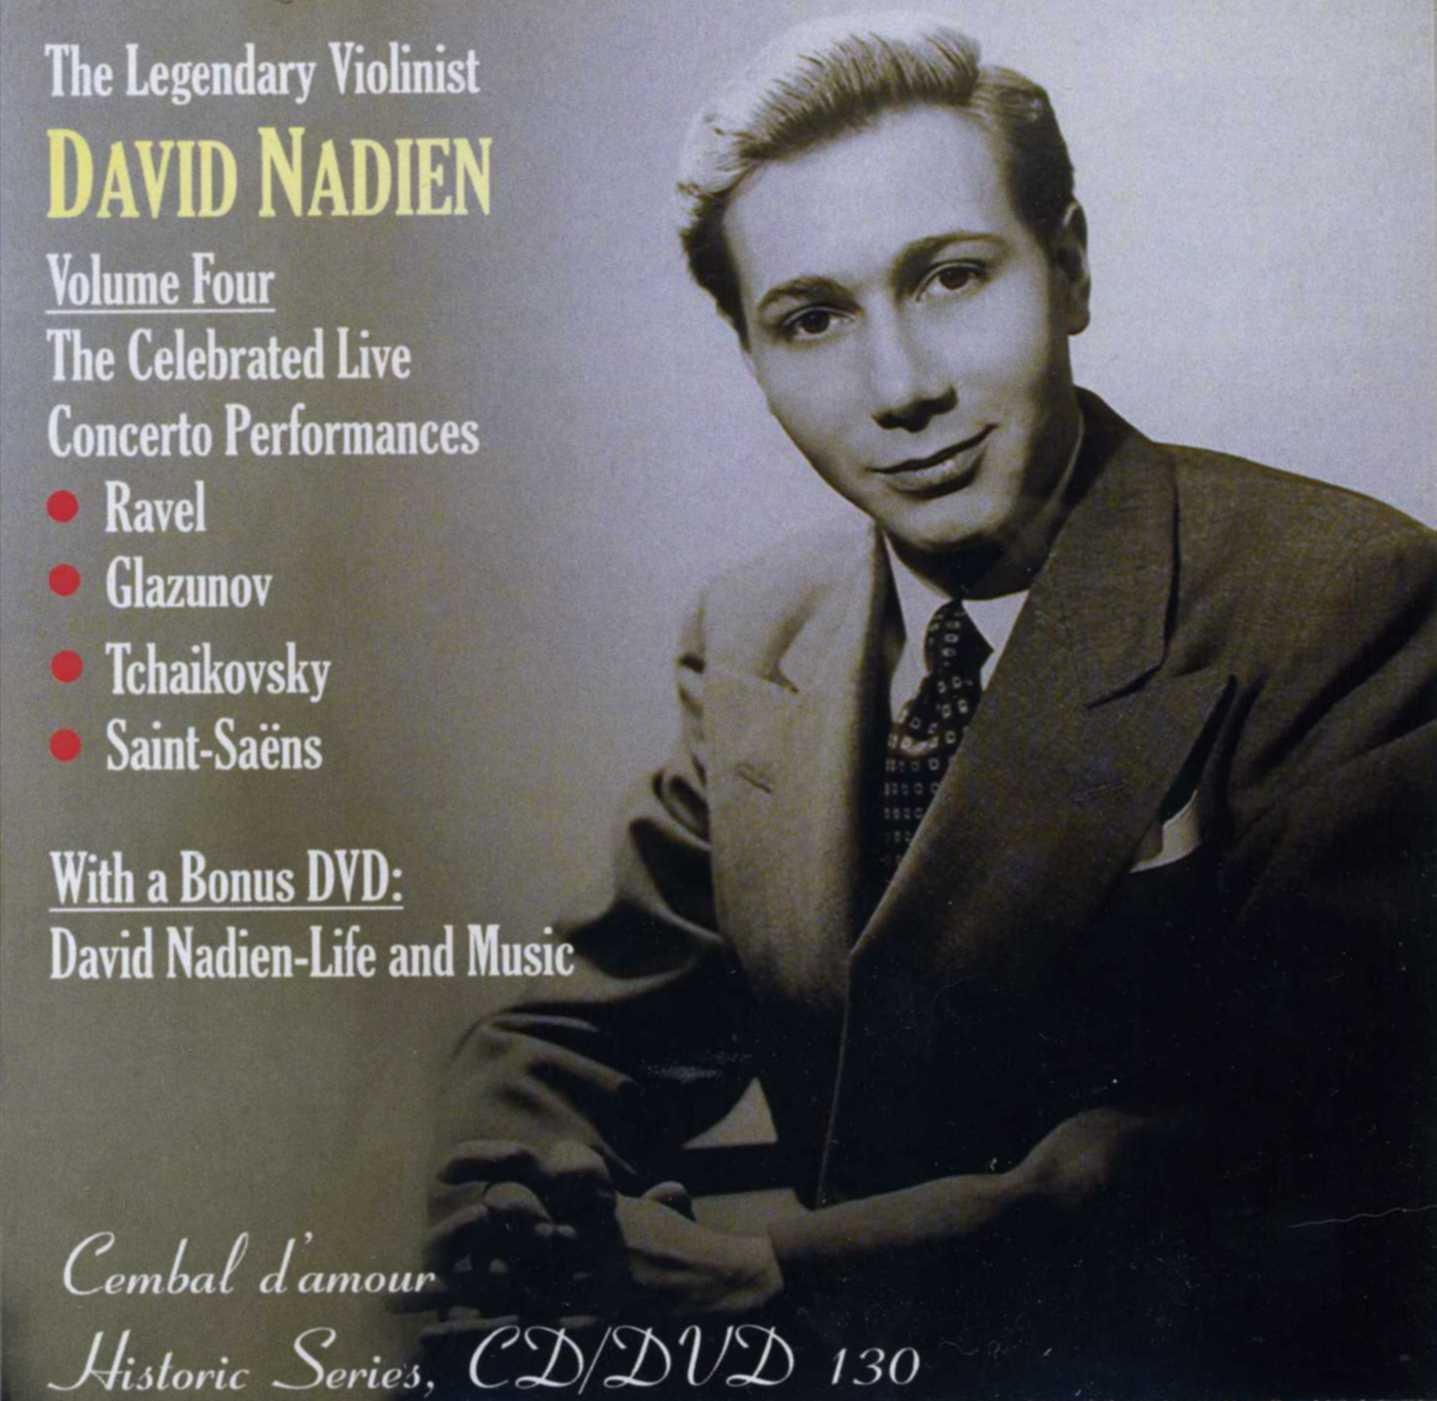 The Celebrated Live Concerto Performances